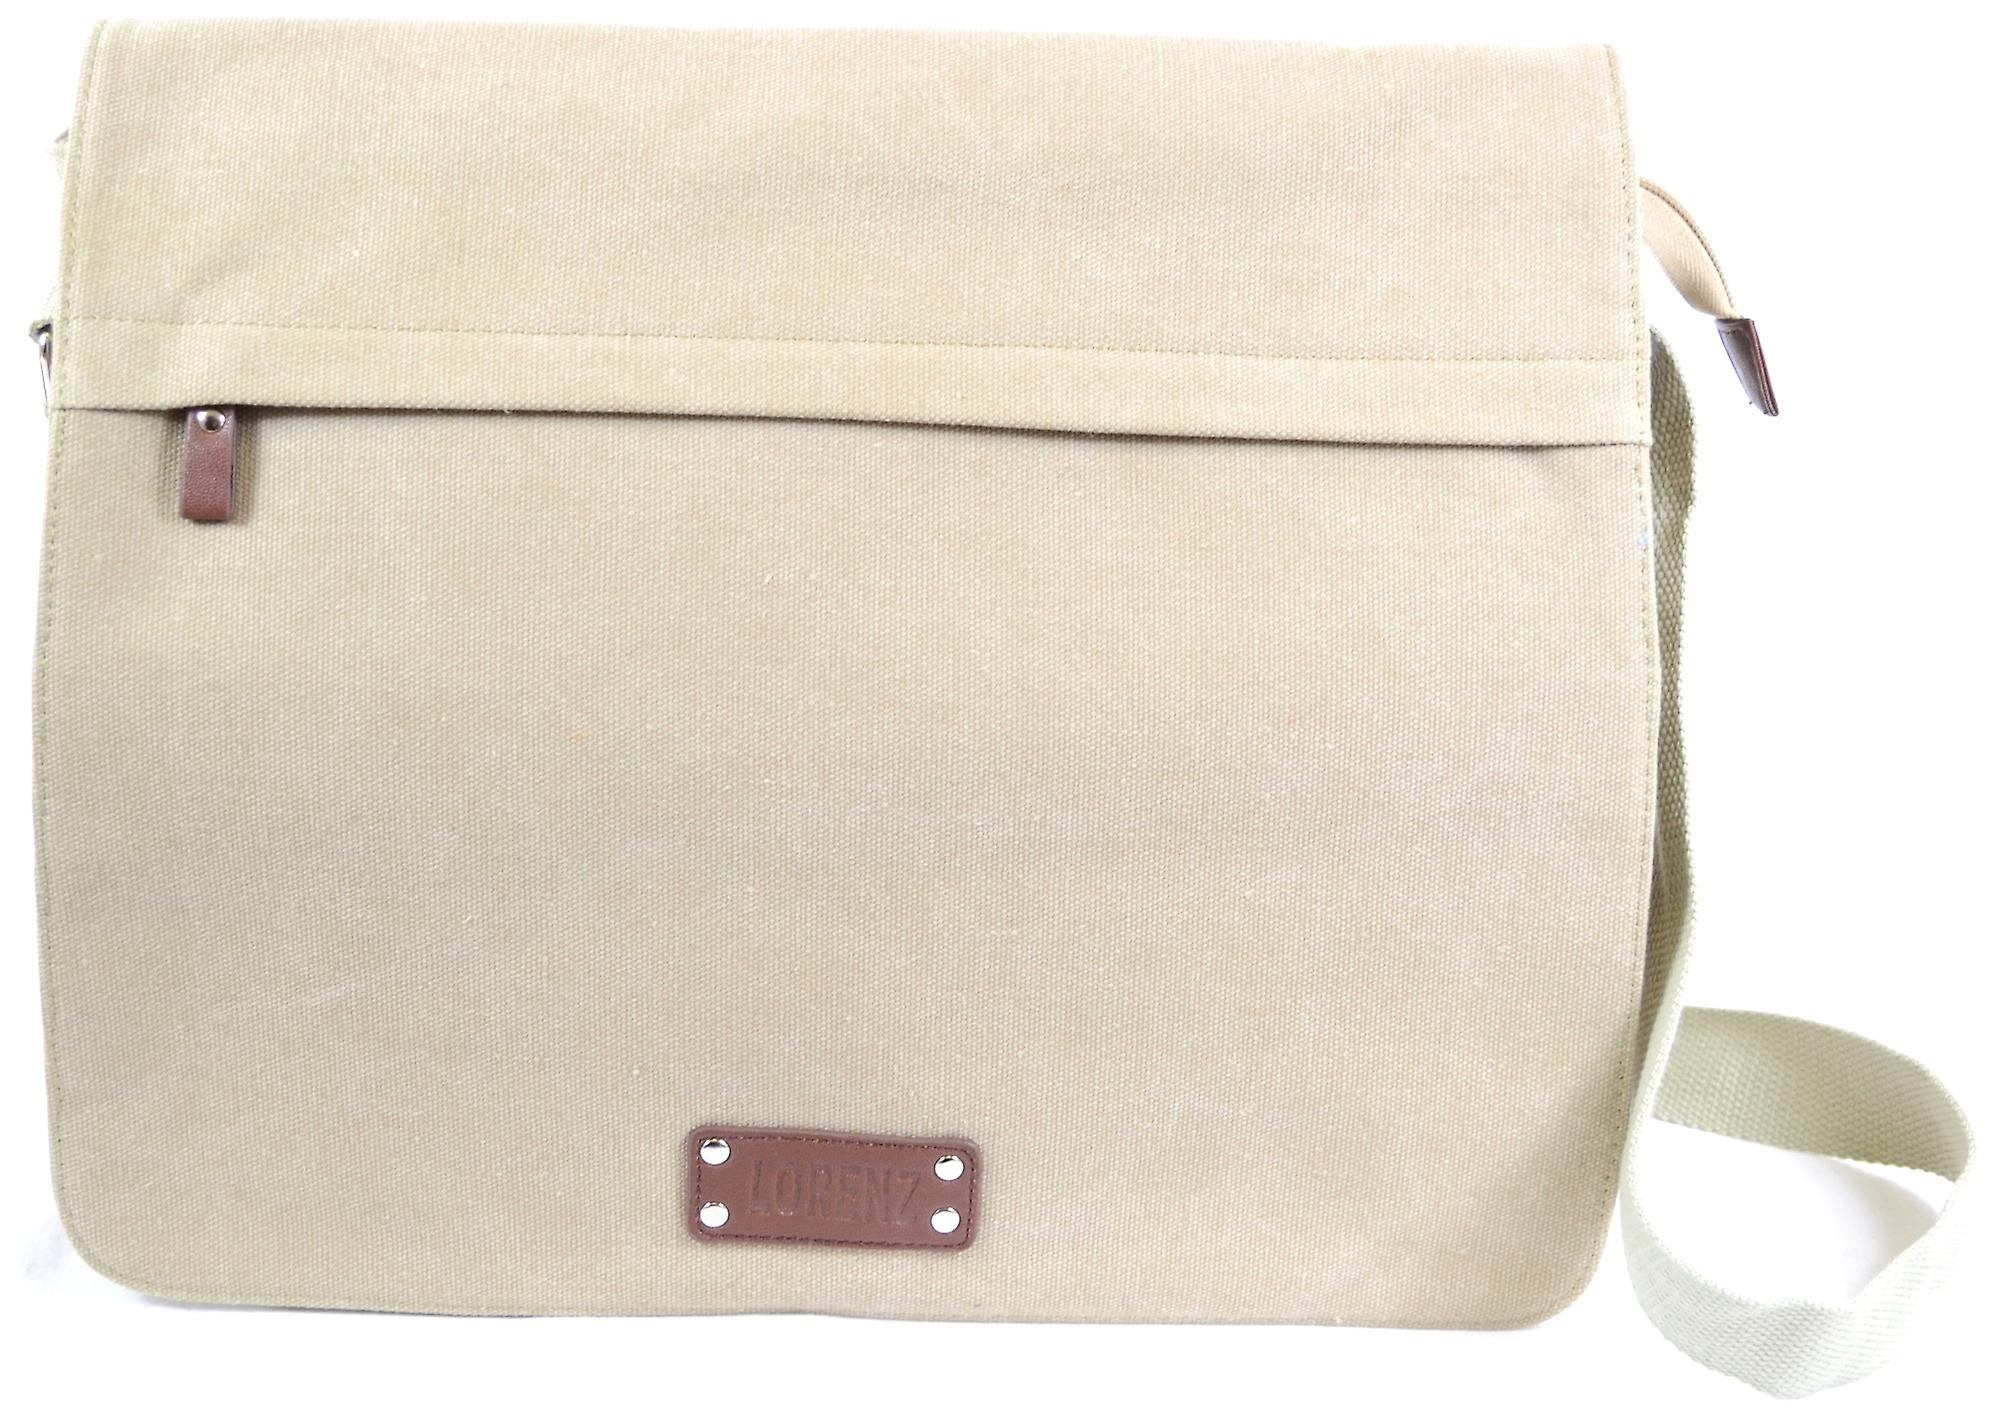 Mens / Ladies Work Bag / Large Messenger Canvas Bag with Removable Inner Sleeve ( Khaki Sand )